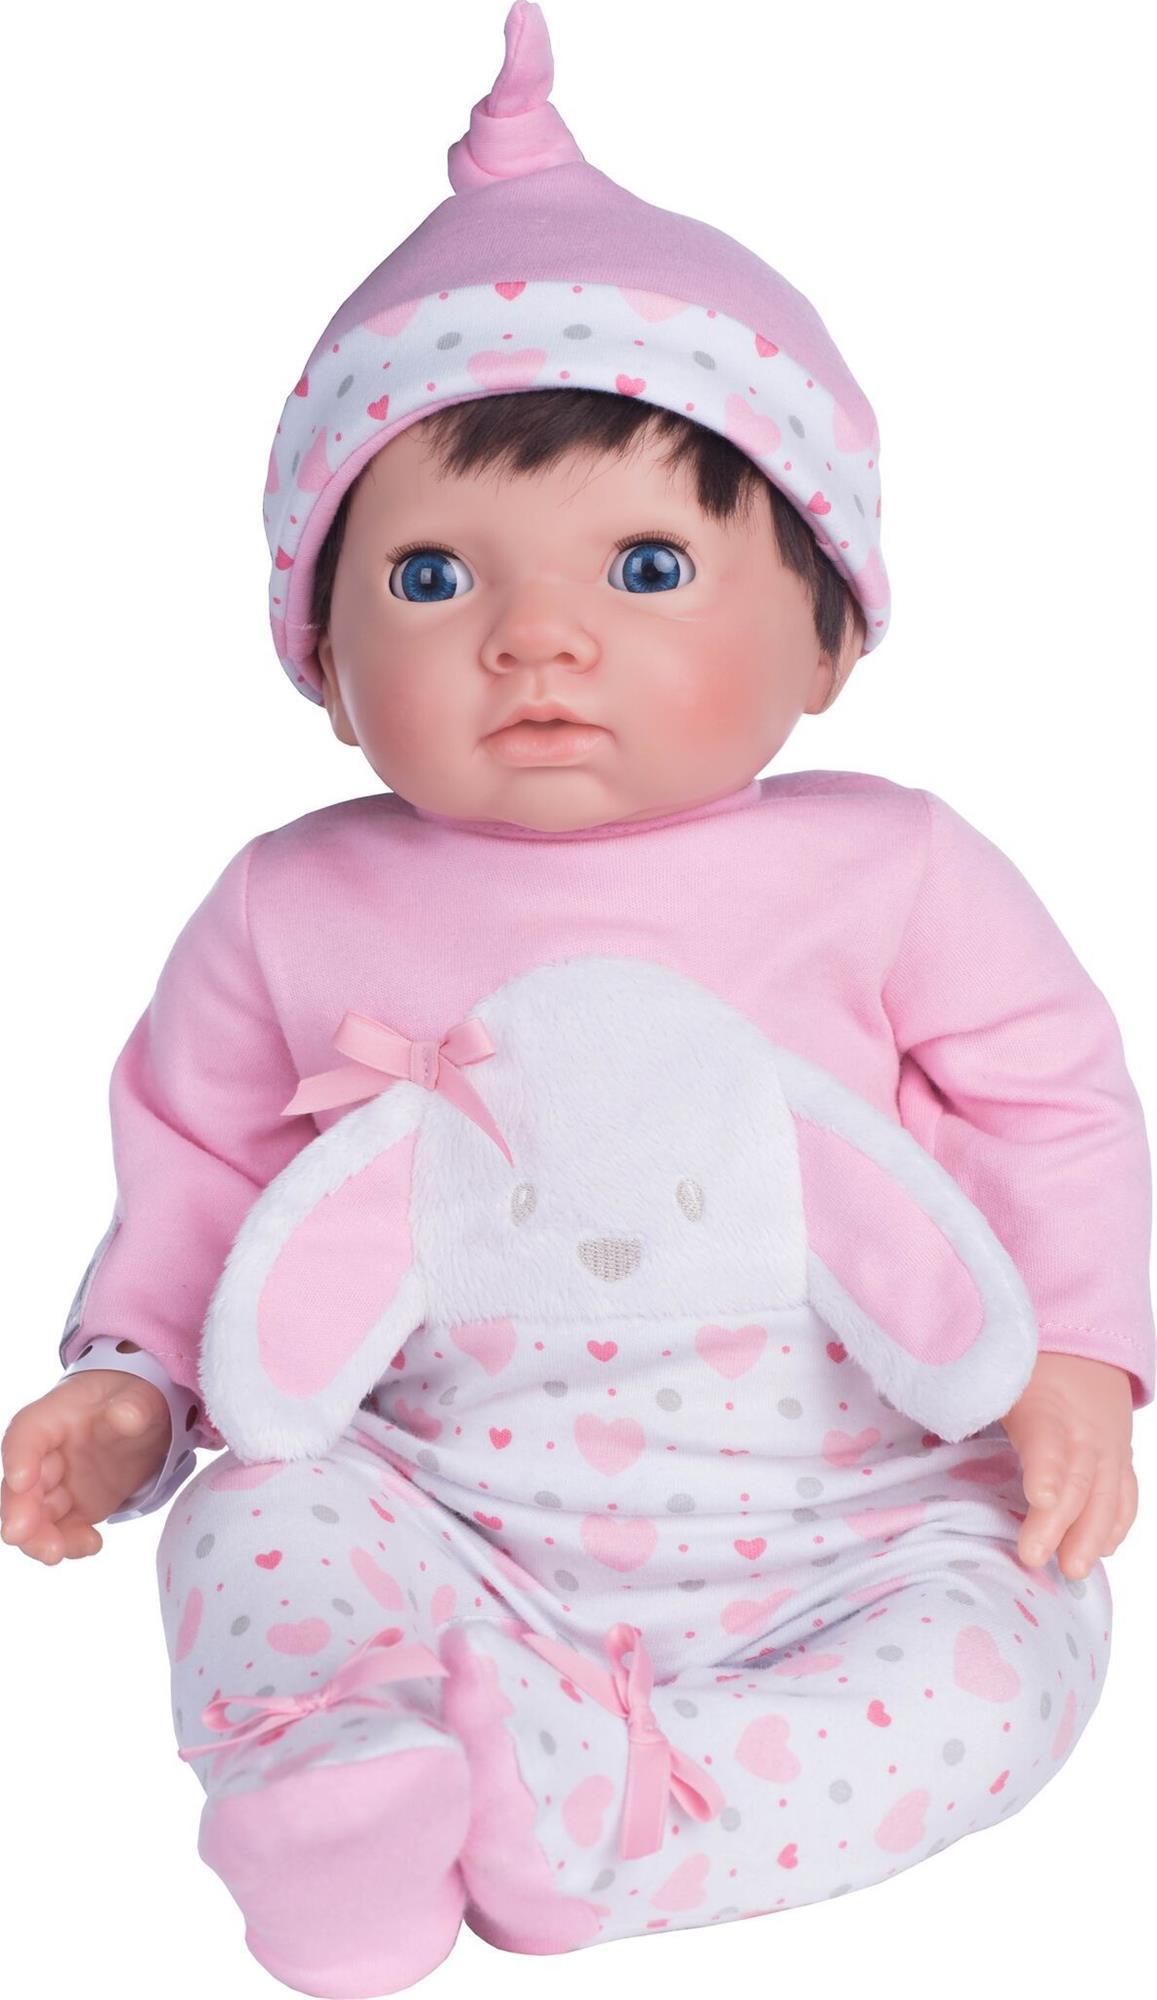 Japanilainen seksi lelu nukke